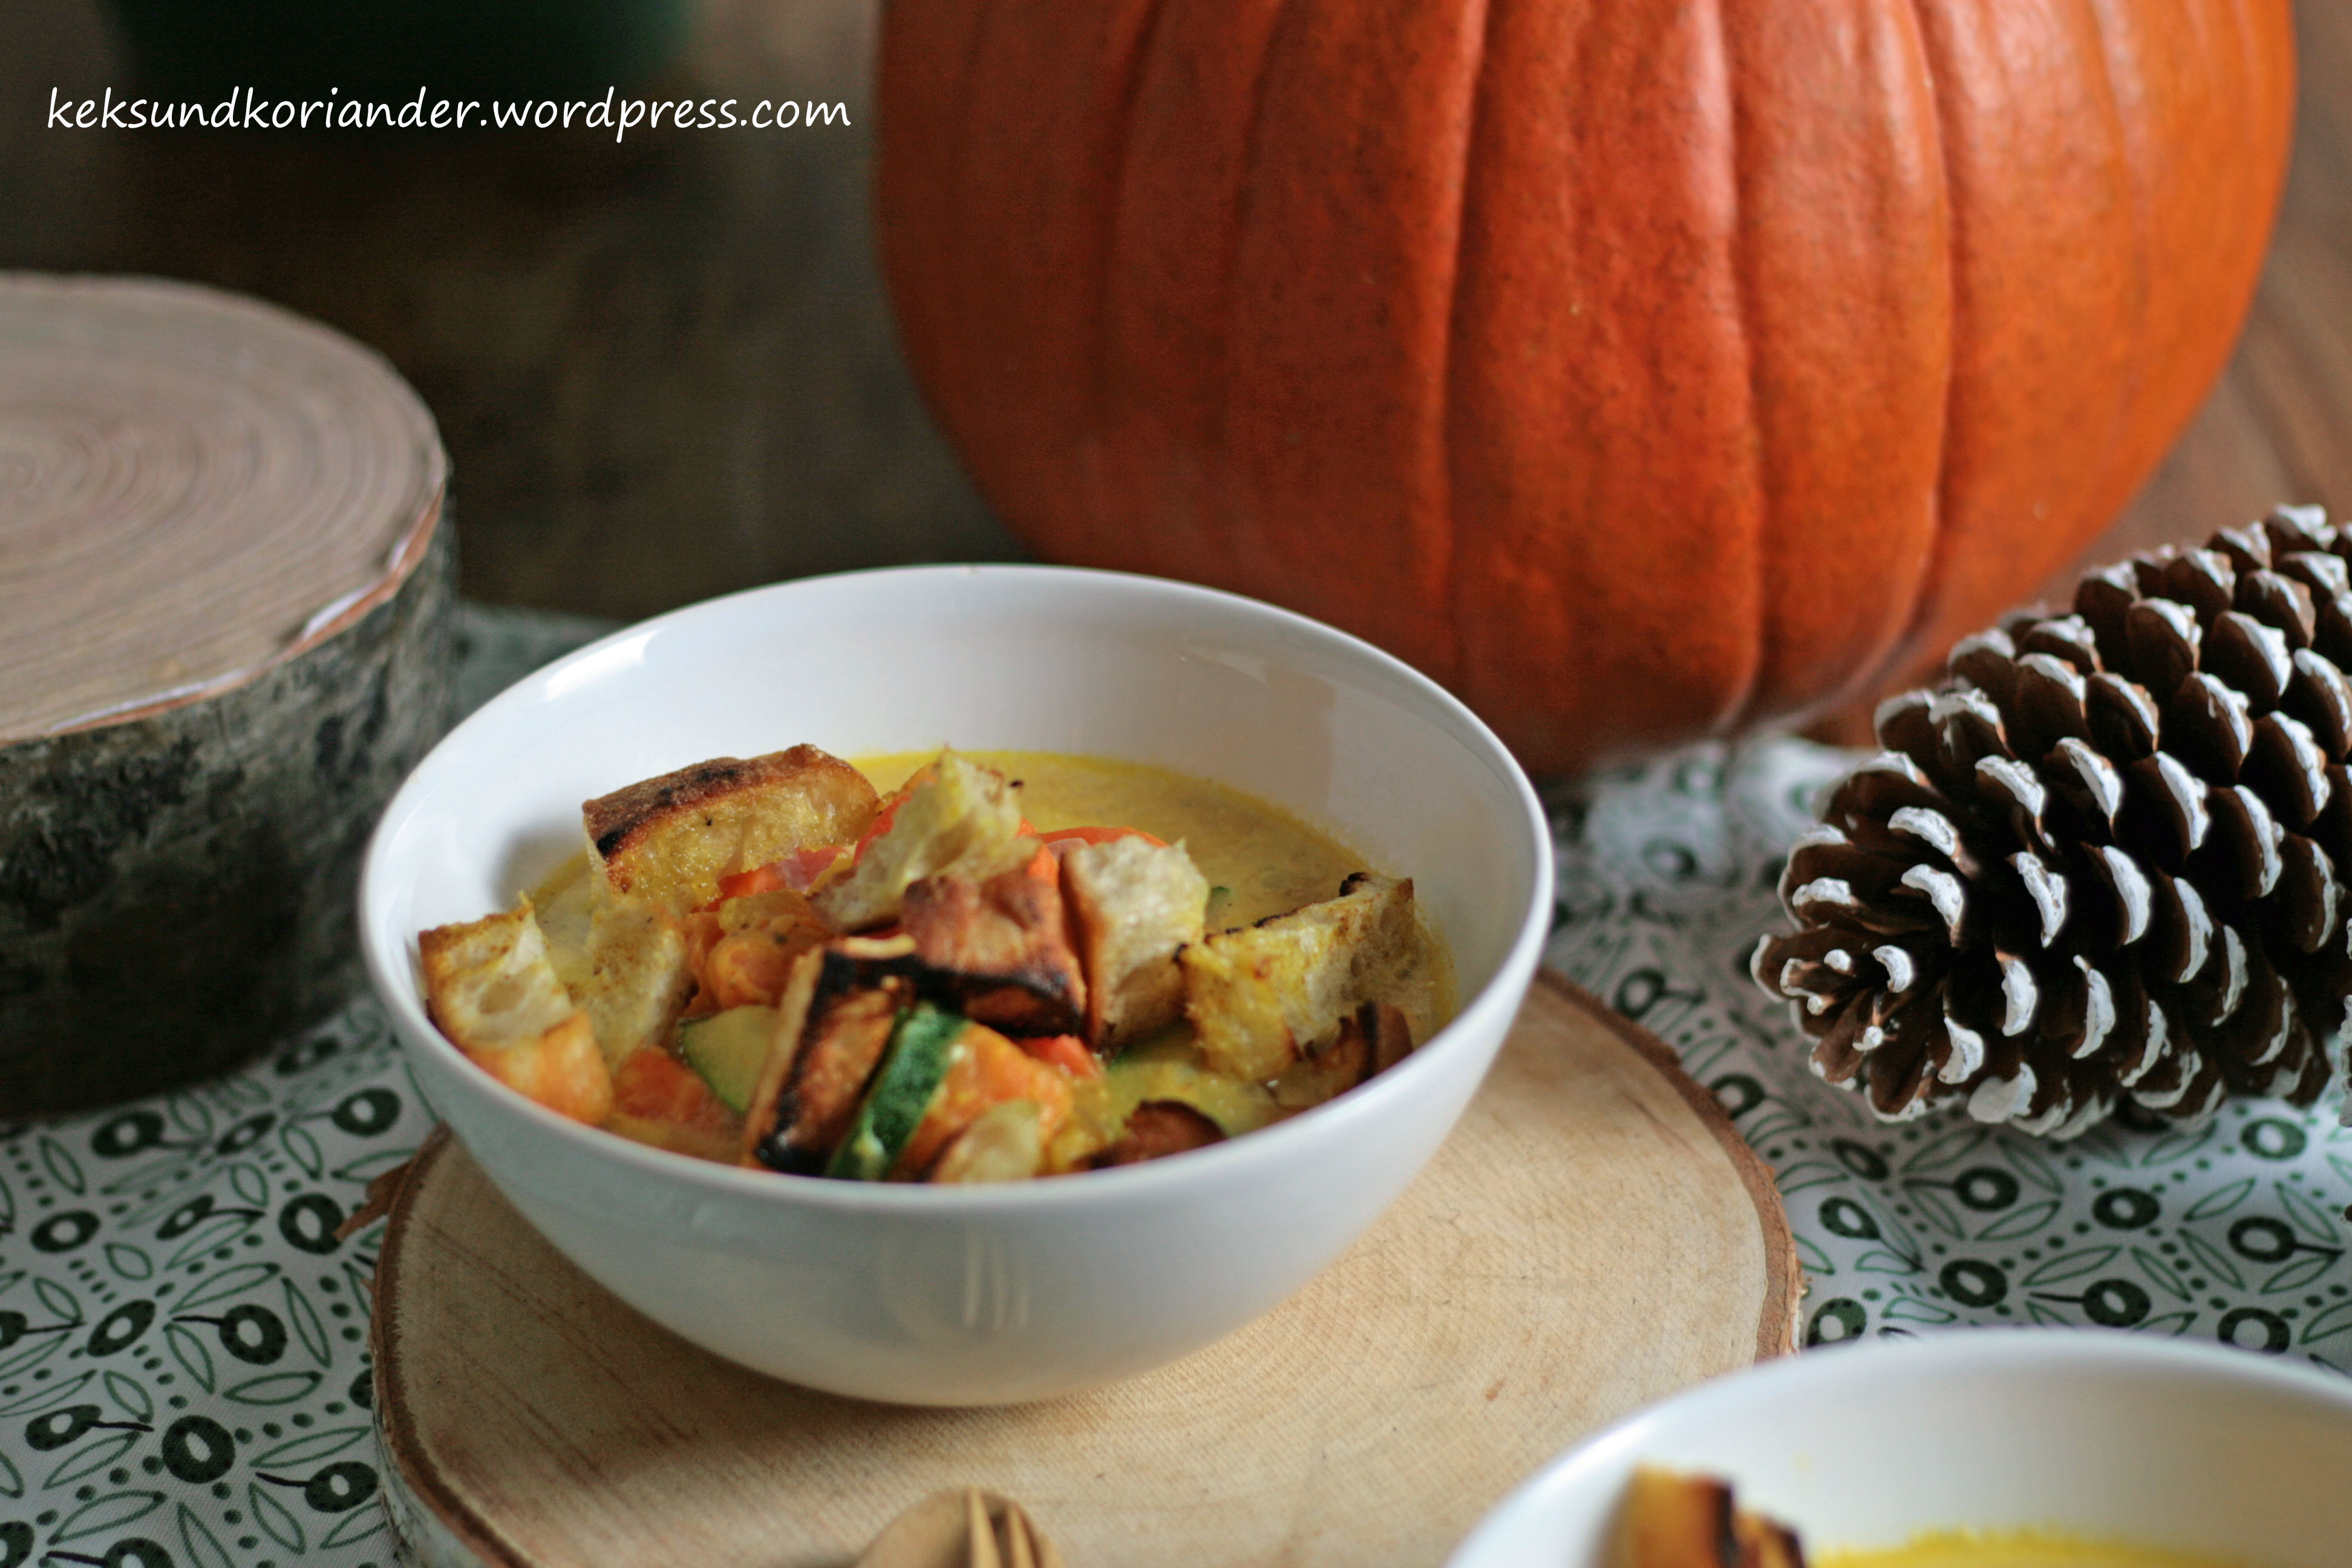 Kürbis-Süßkartoffel-Eintopf mit Curry4